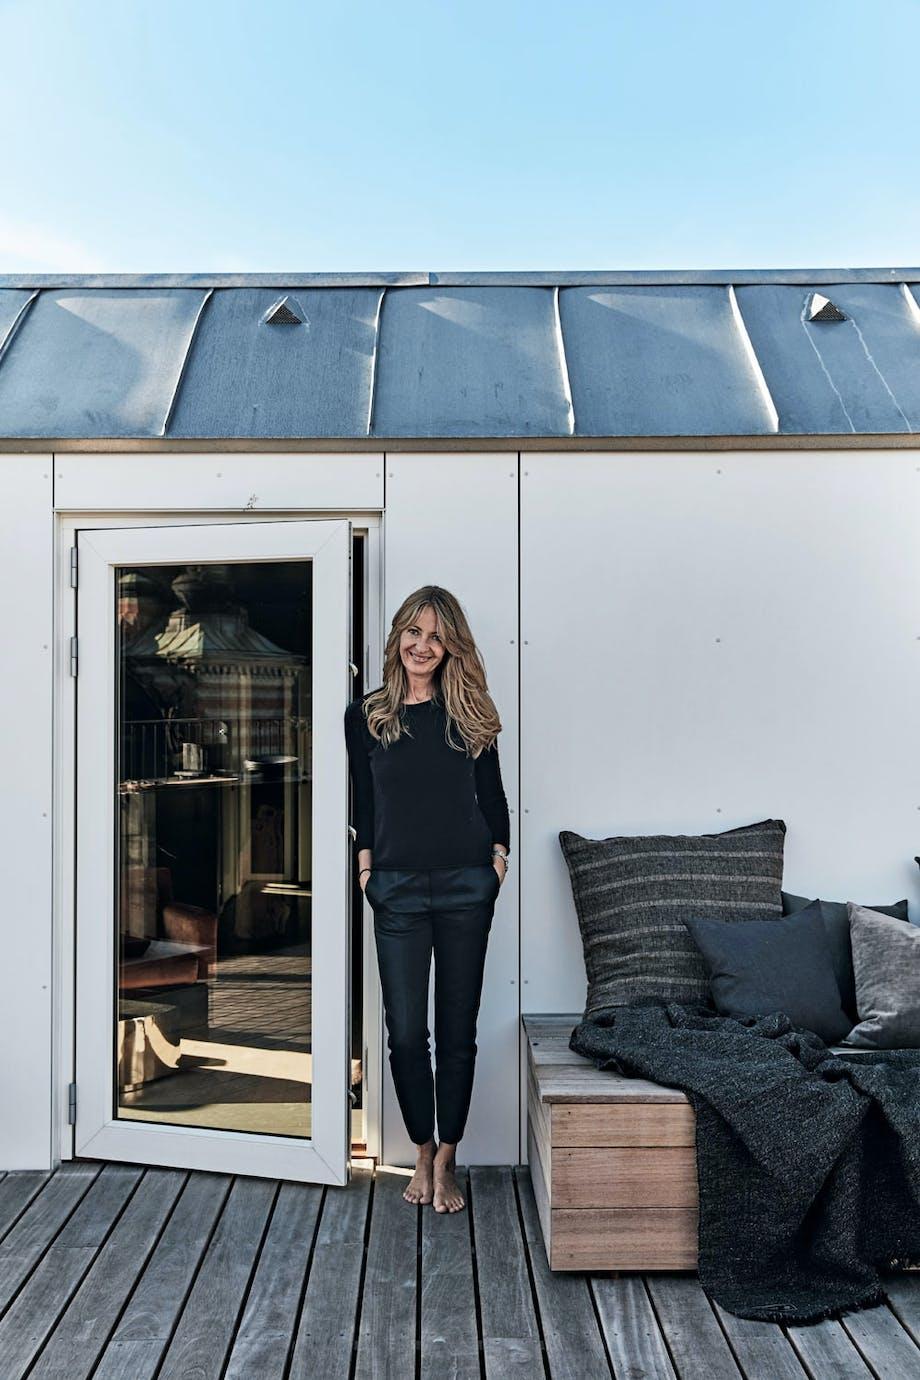 Michala Jessens ute på takterrassen sin